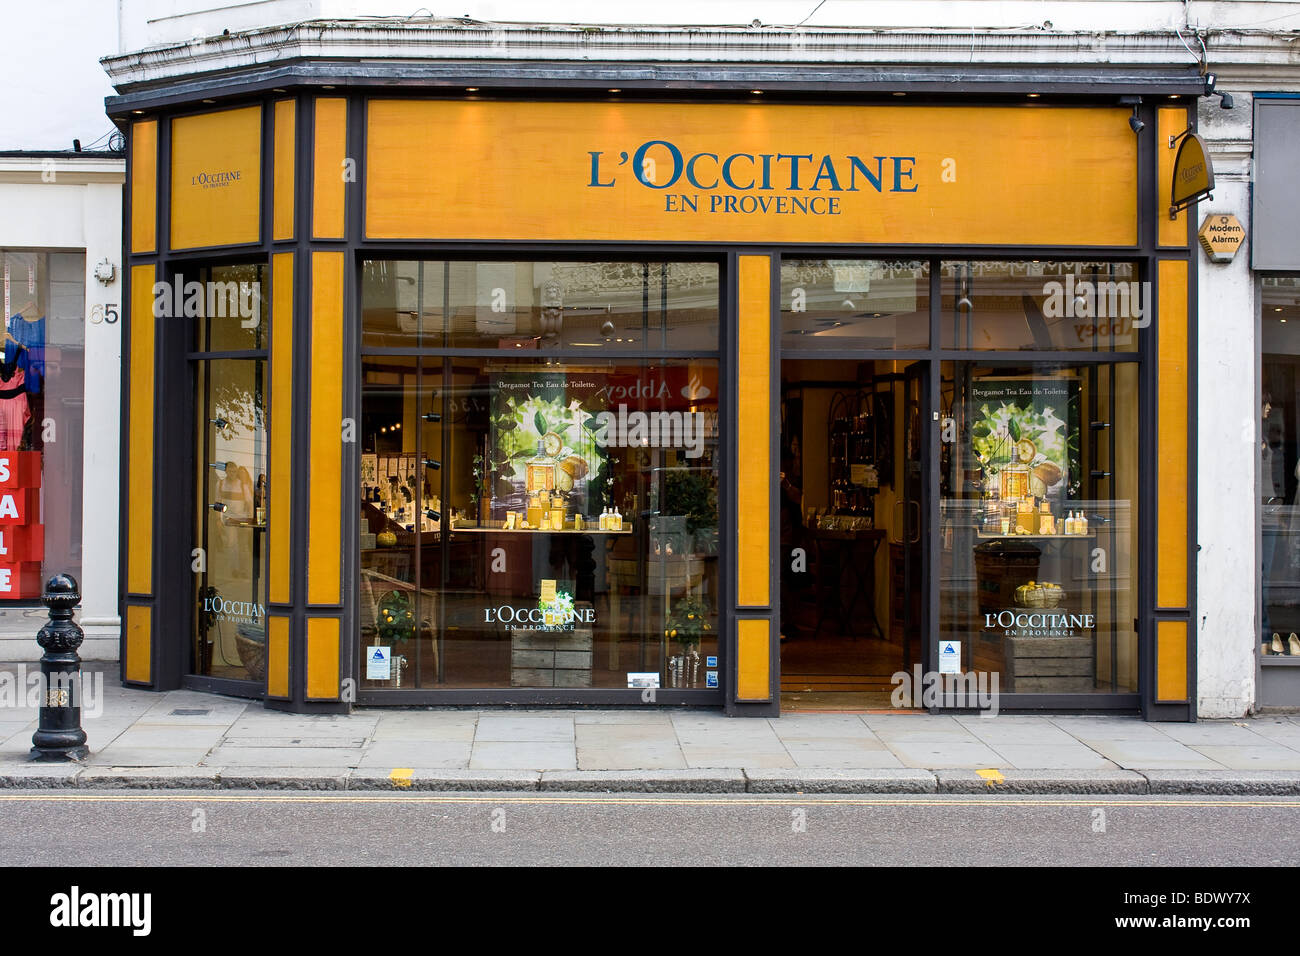 L'Occitane En Provence shop front, King's Road - Stock Image